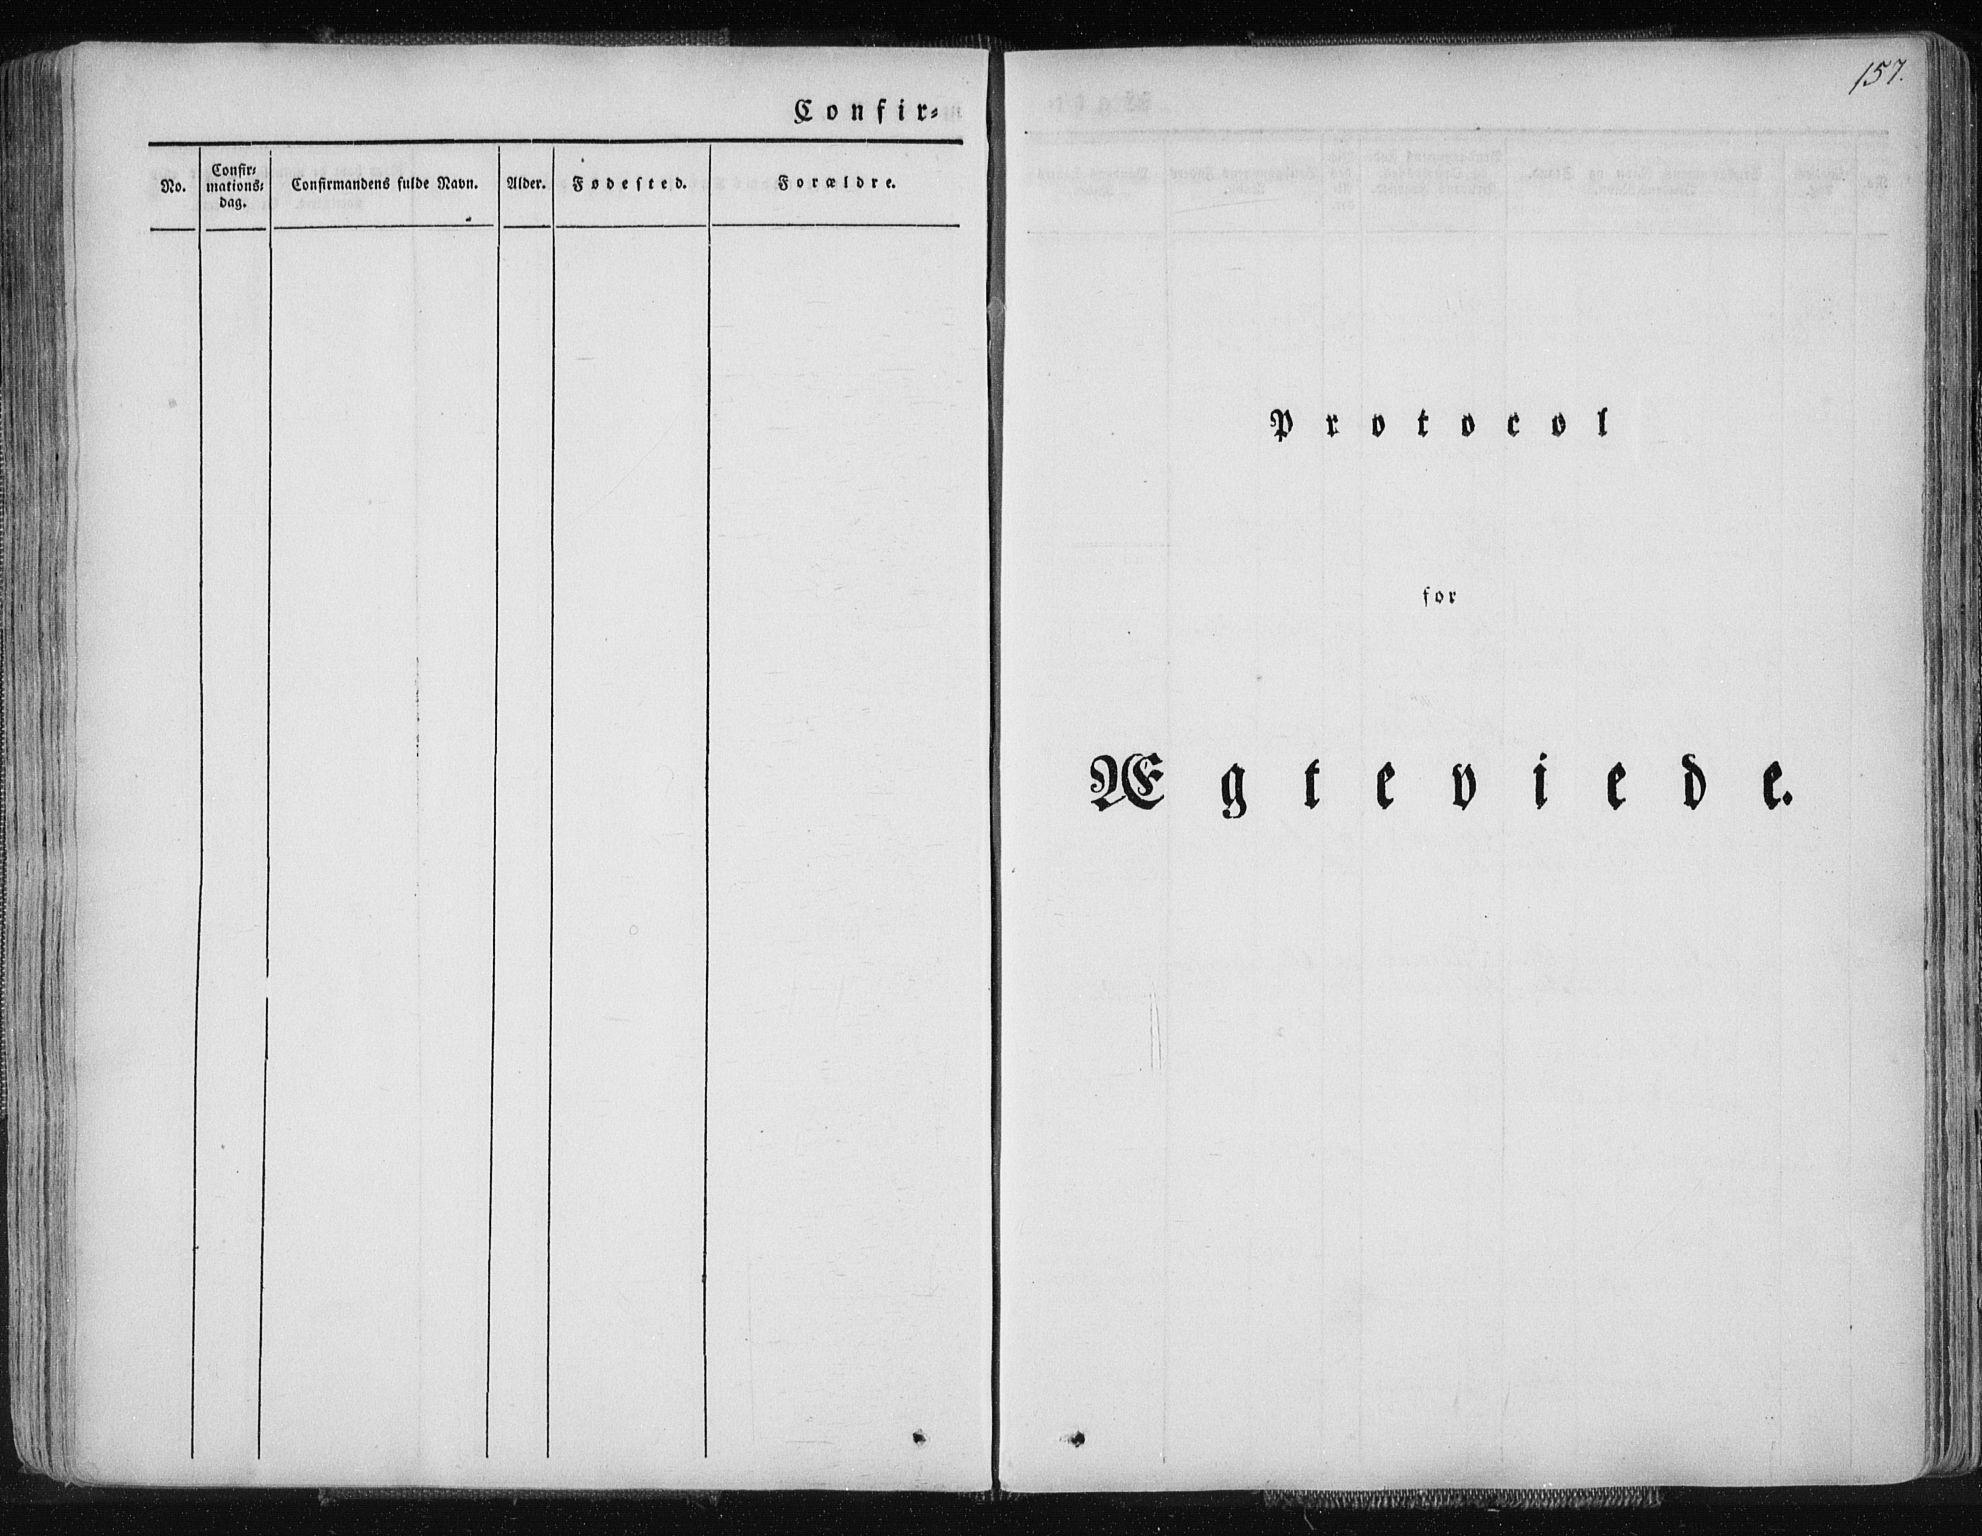 SAT, Ministerialprotokoller, klokkerbøker og fødselsregistre - Nordland, 827/L0390: Ministerialbok nr. 827A02, 1826-1841, s. 157